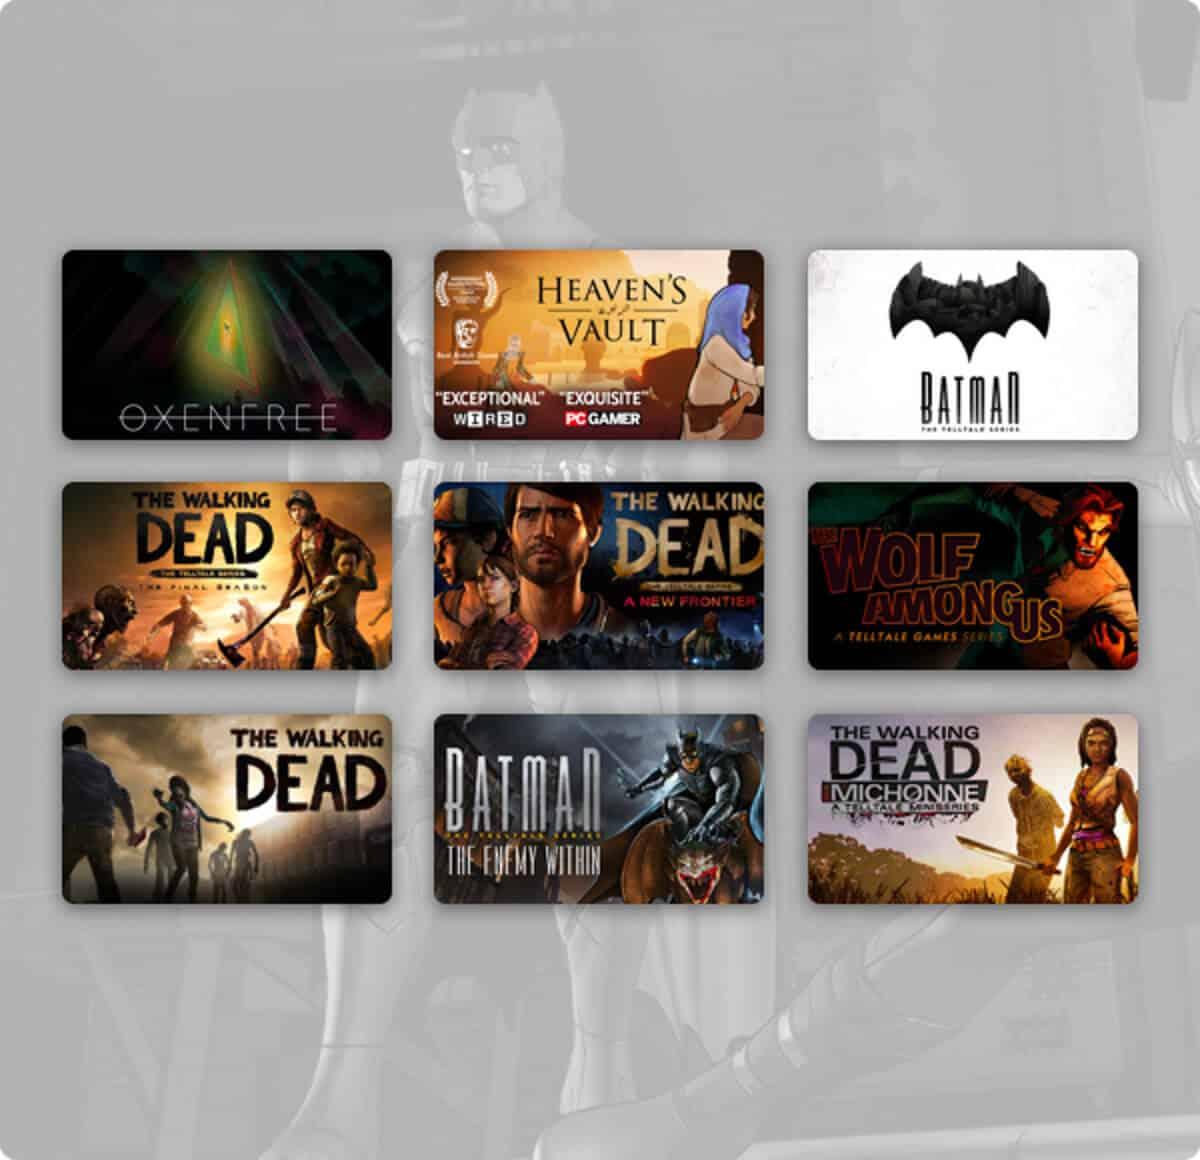 humble summer adventure games bundle list with proton for linux mac windows pc